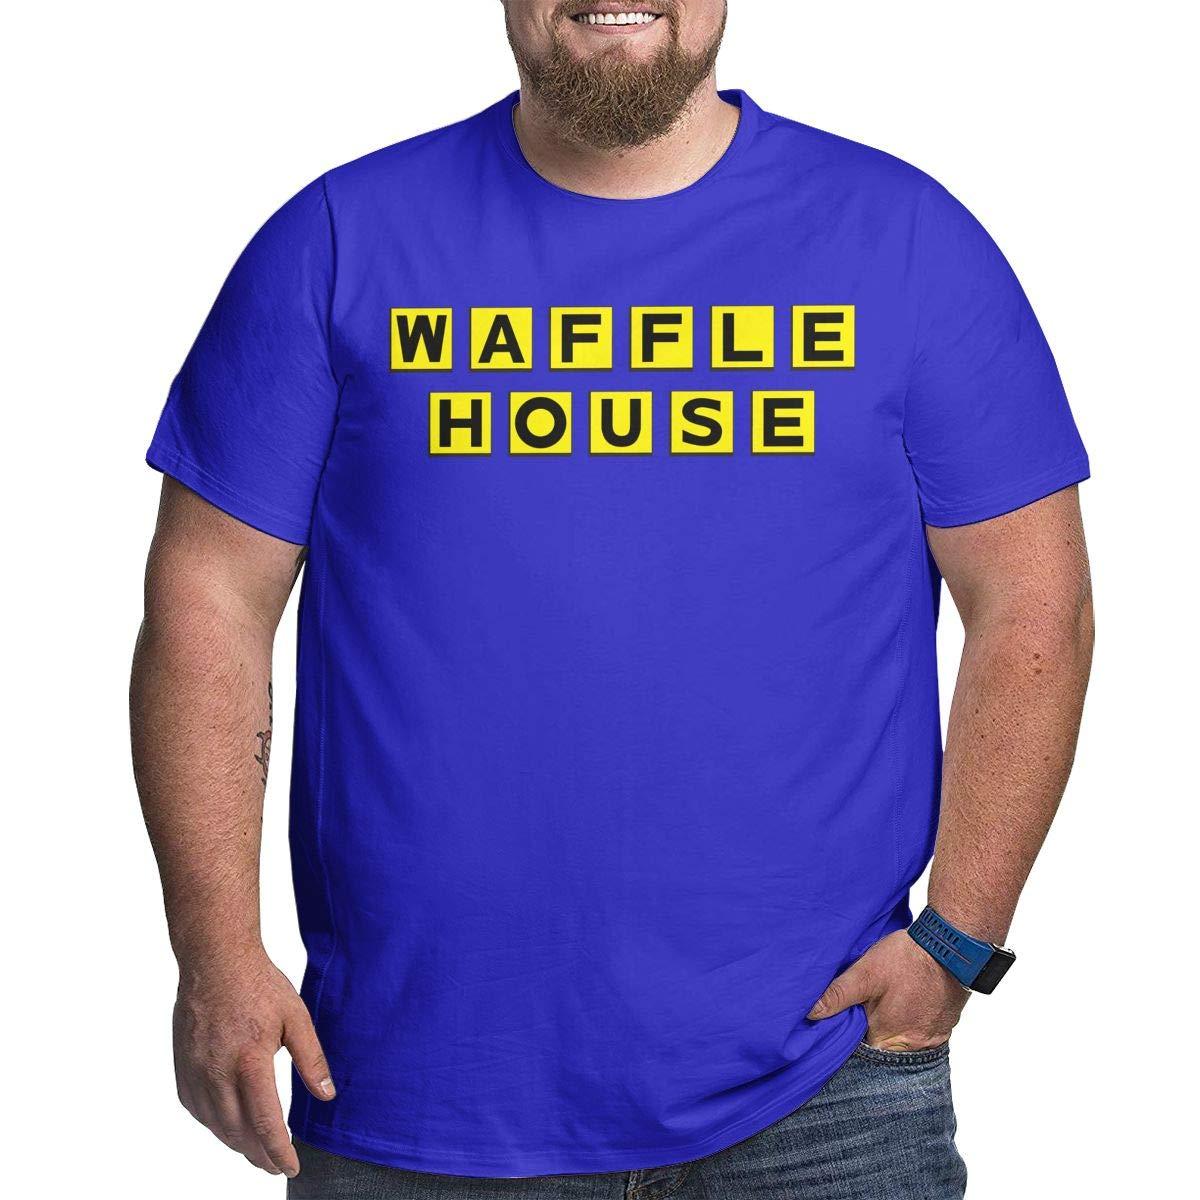 Fat Men's T Shirt Waffle House Logo Tee Shirts T-Shirt Short-Sleeve Round Neck Tshirt for Men Youth Boys Plus Size Blue 3XL by BKashy